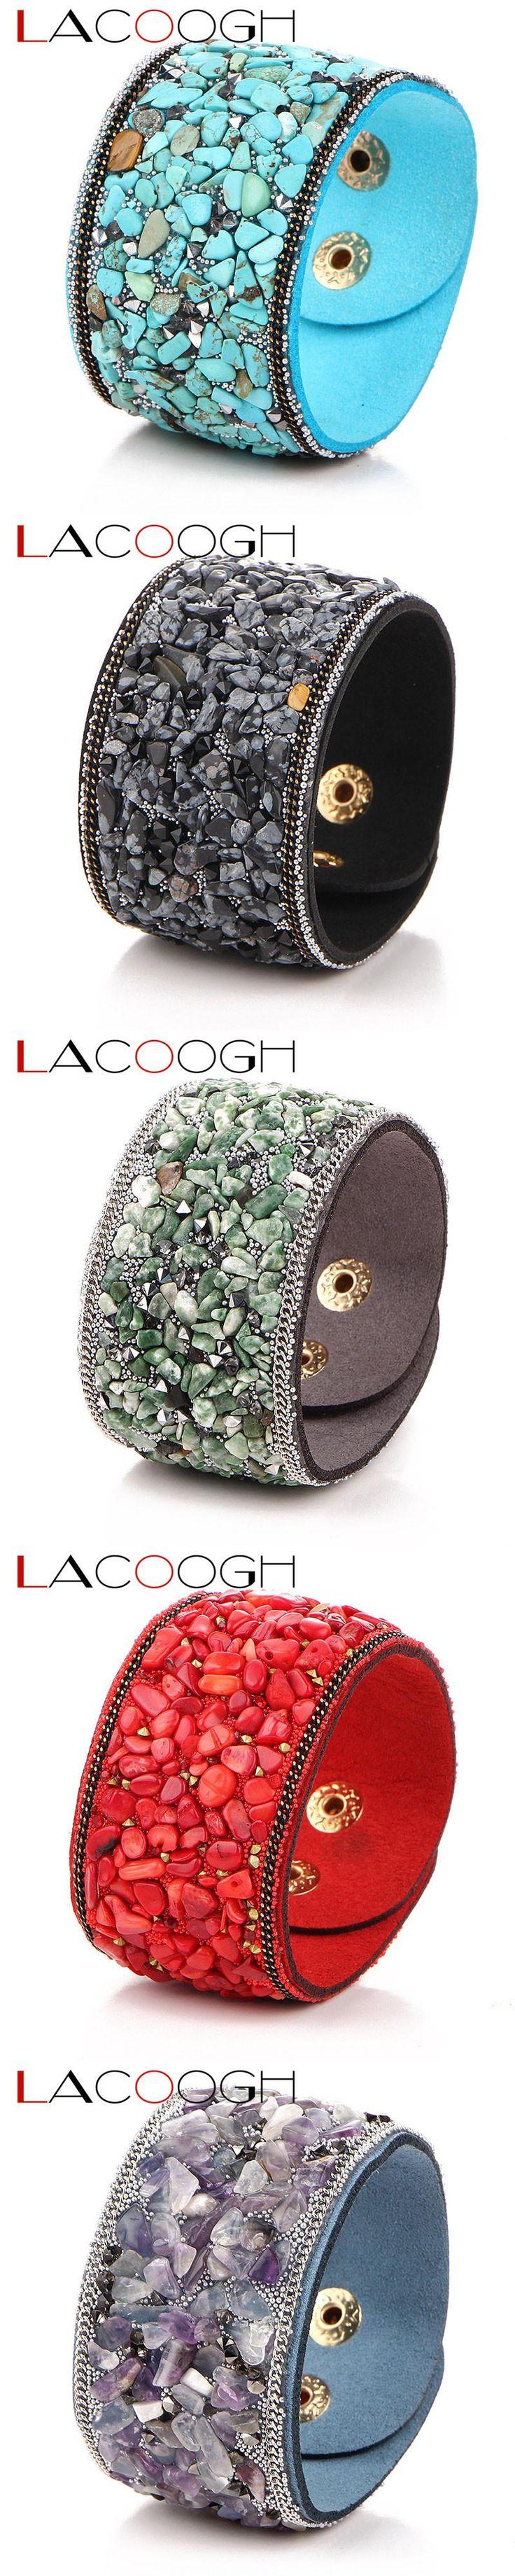 Lacoogh New Pave Gravel Stone  Wristband Bracelet Bangles Handmade Wide Leather Cuff Bracelets For Women Pulseras F6113